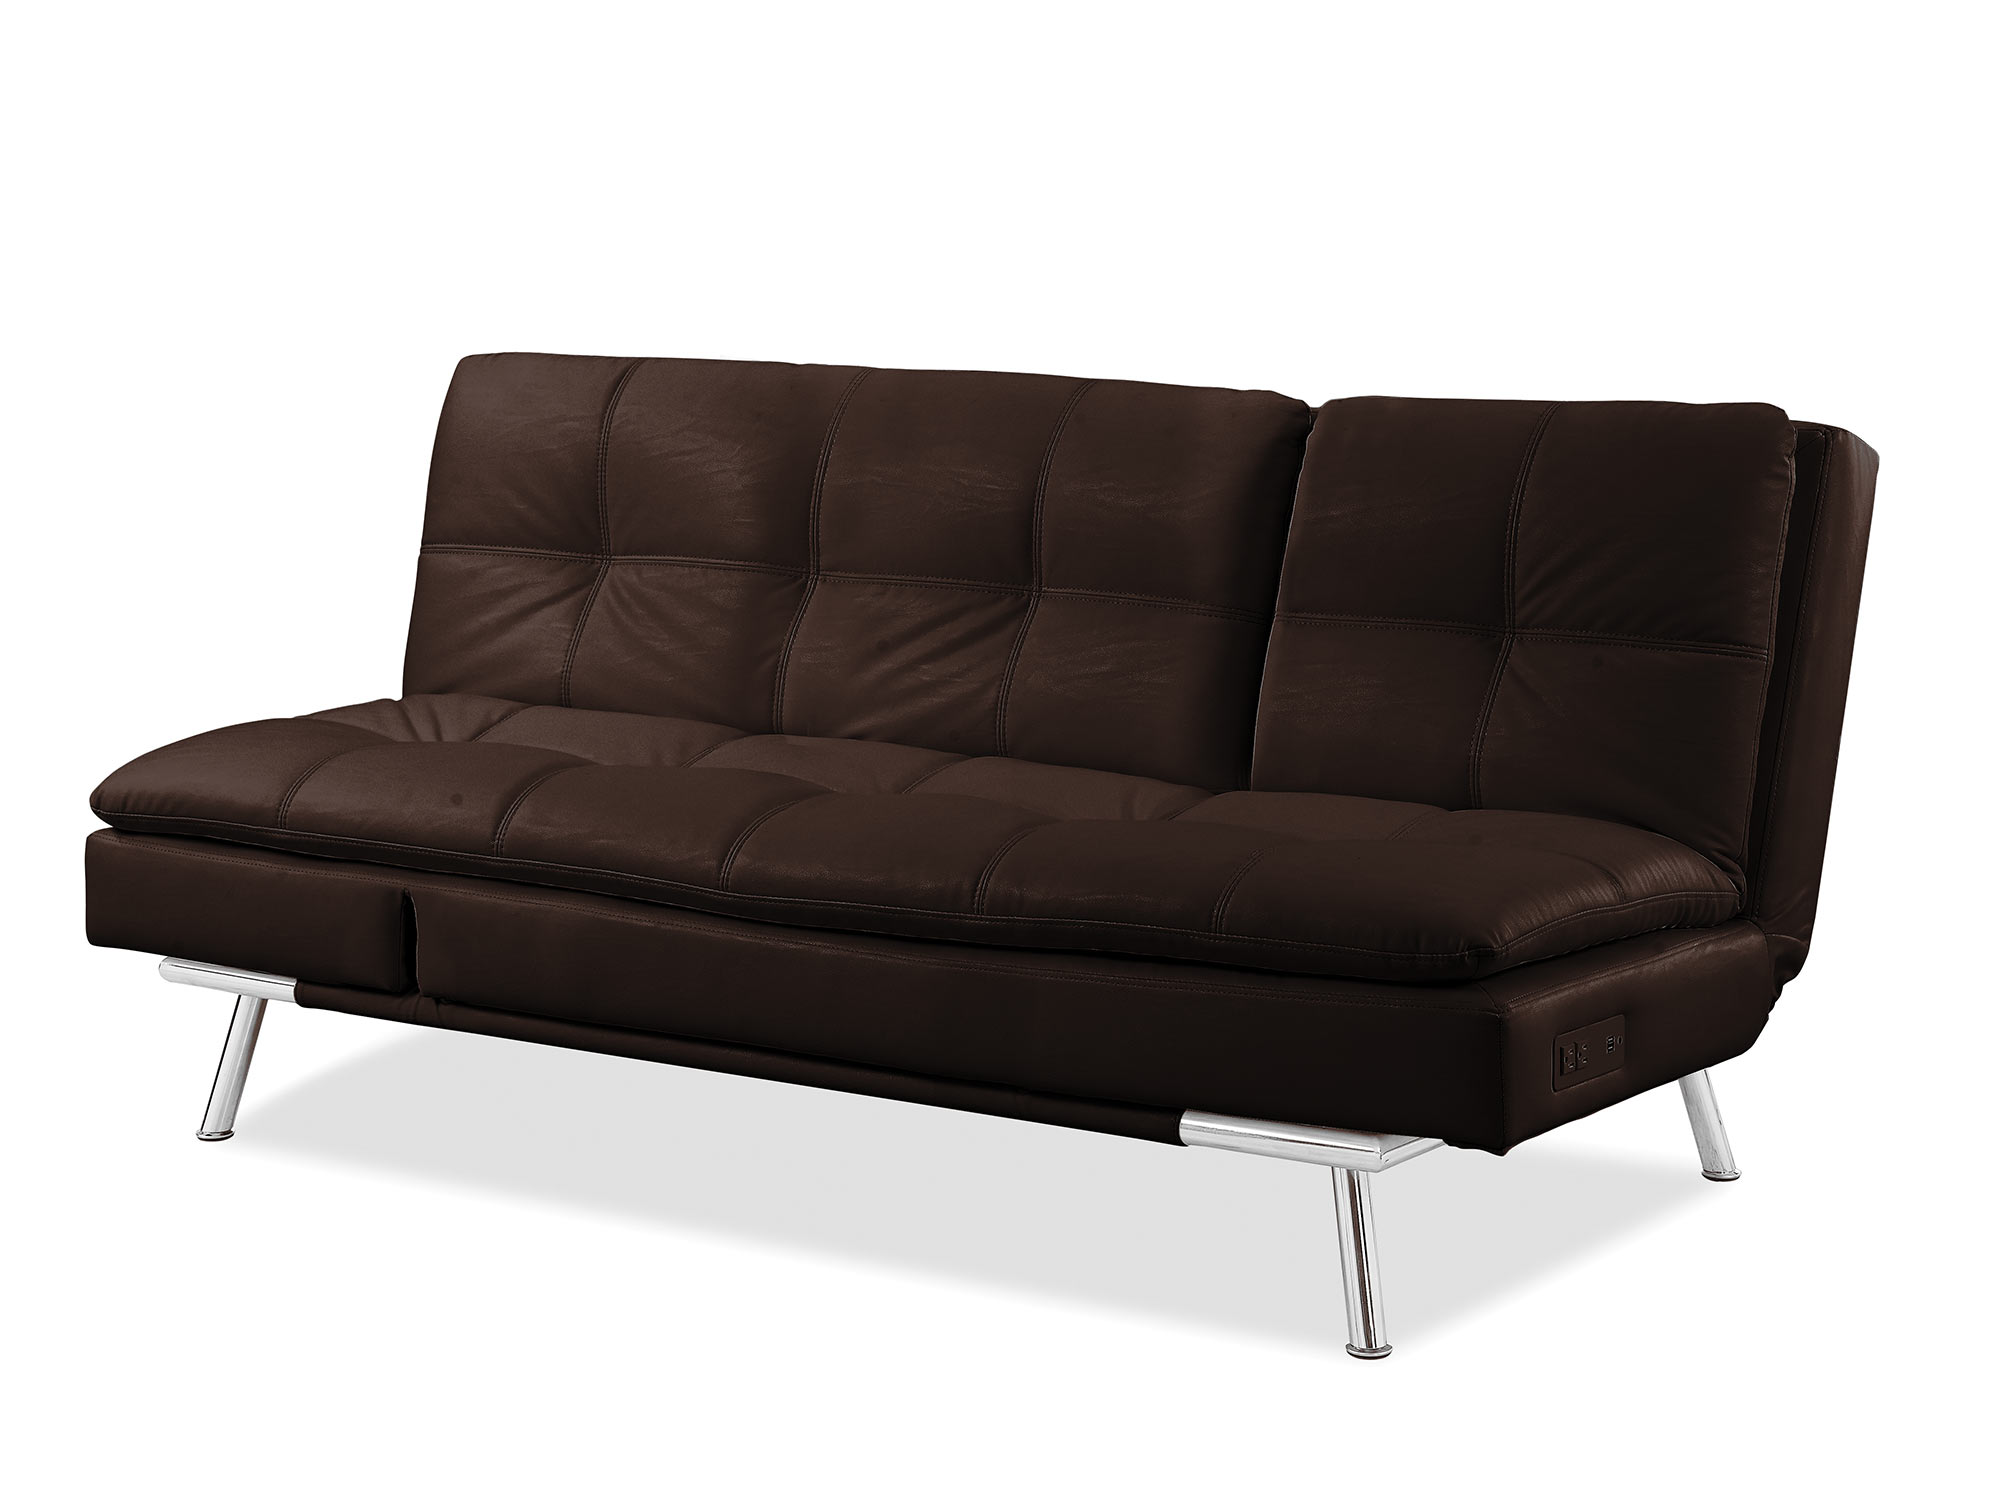 palermo convertible sofa java by serta lifestyle. Black Bedroom Furniture Sets. Home Design Ideas